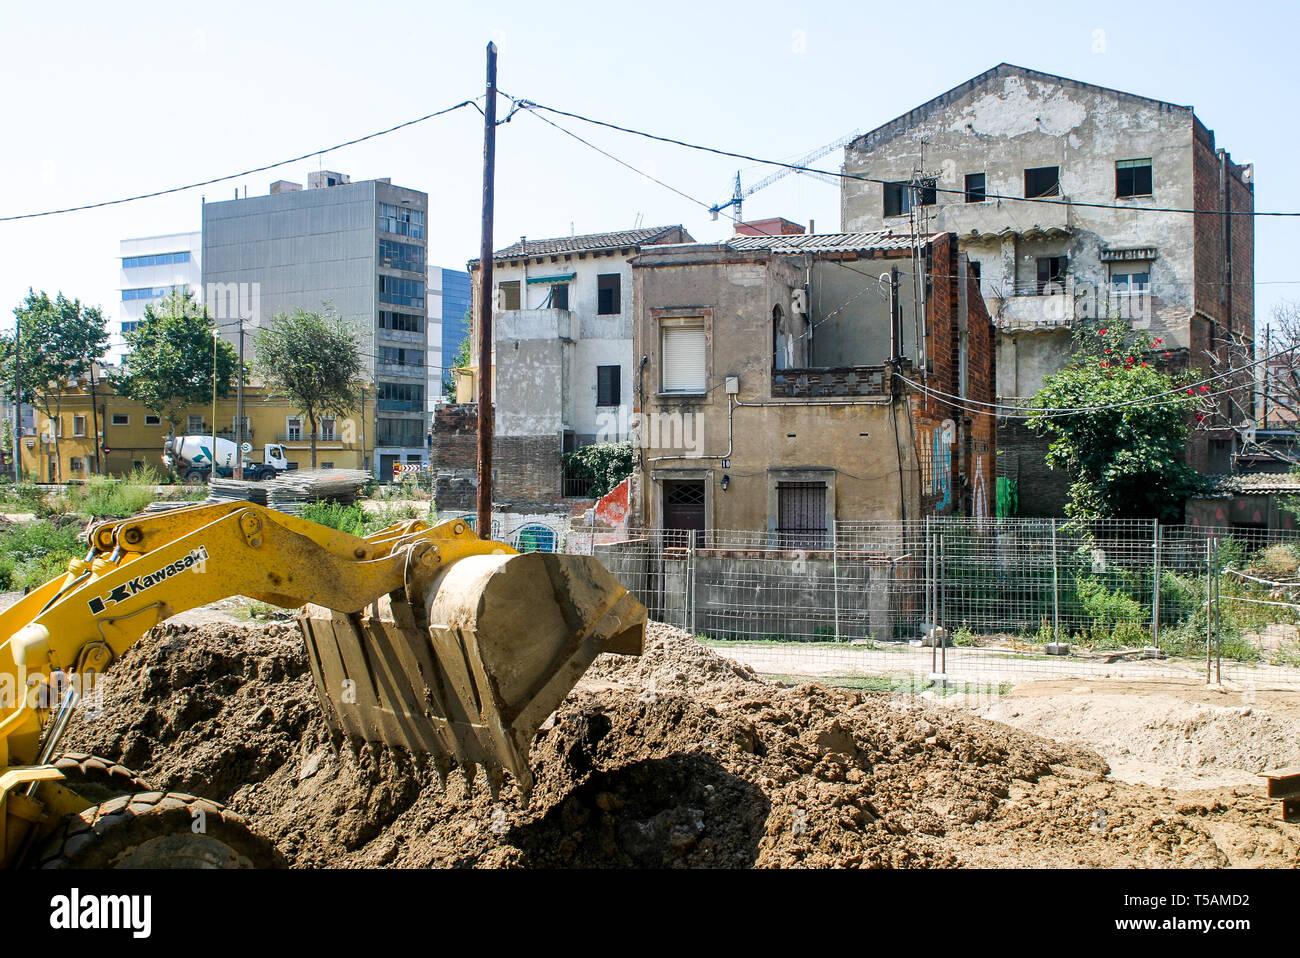 Construction works, Diagonal del Mar area, Barcelone, Catalonia, Spain Stock Photo